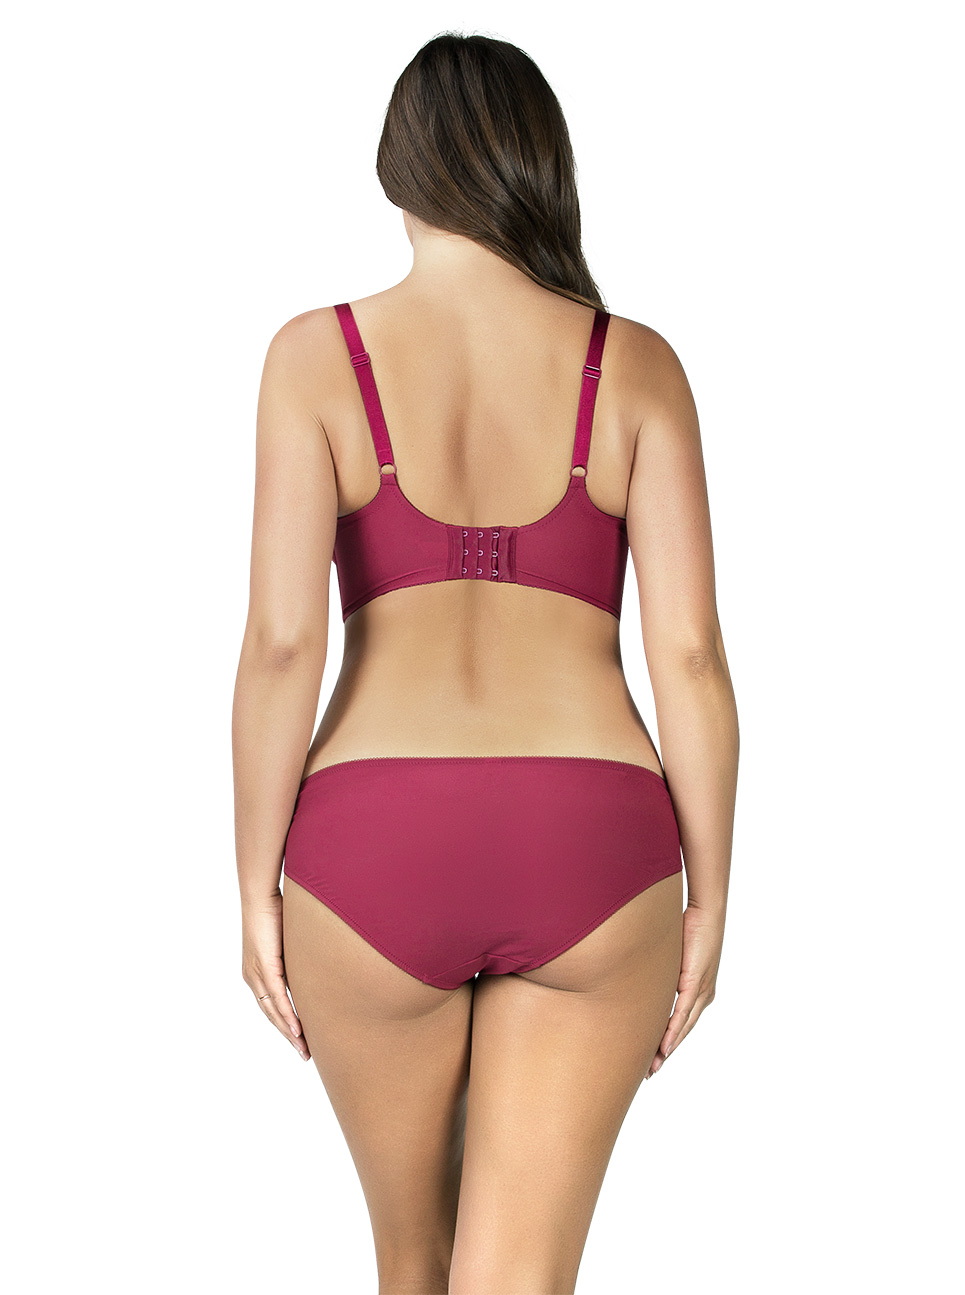 PARFAIT Cora UnlinedLonglineBraP5632 BikiniP5633 Crimson Back - Cora Bikini Crimson P5633